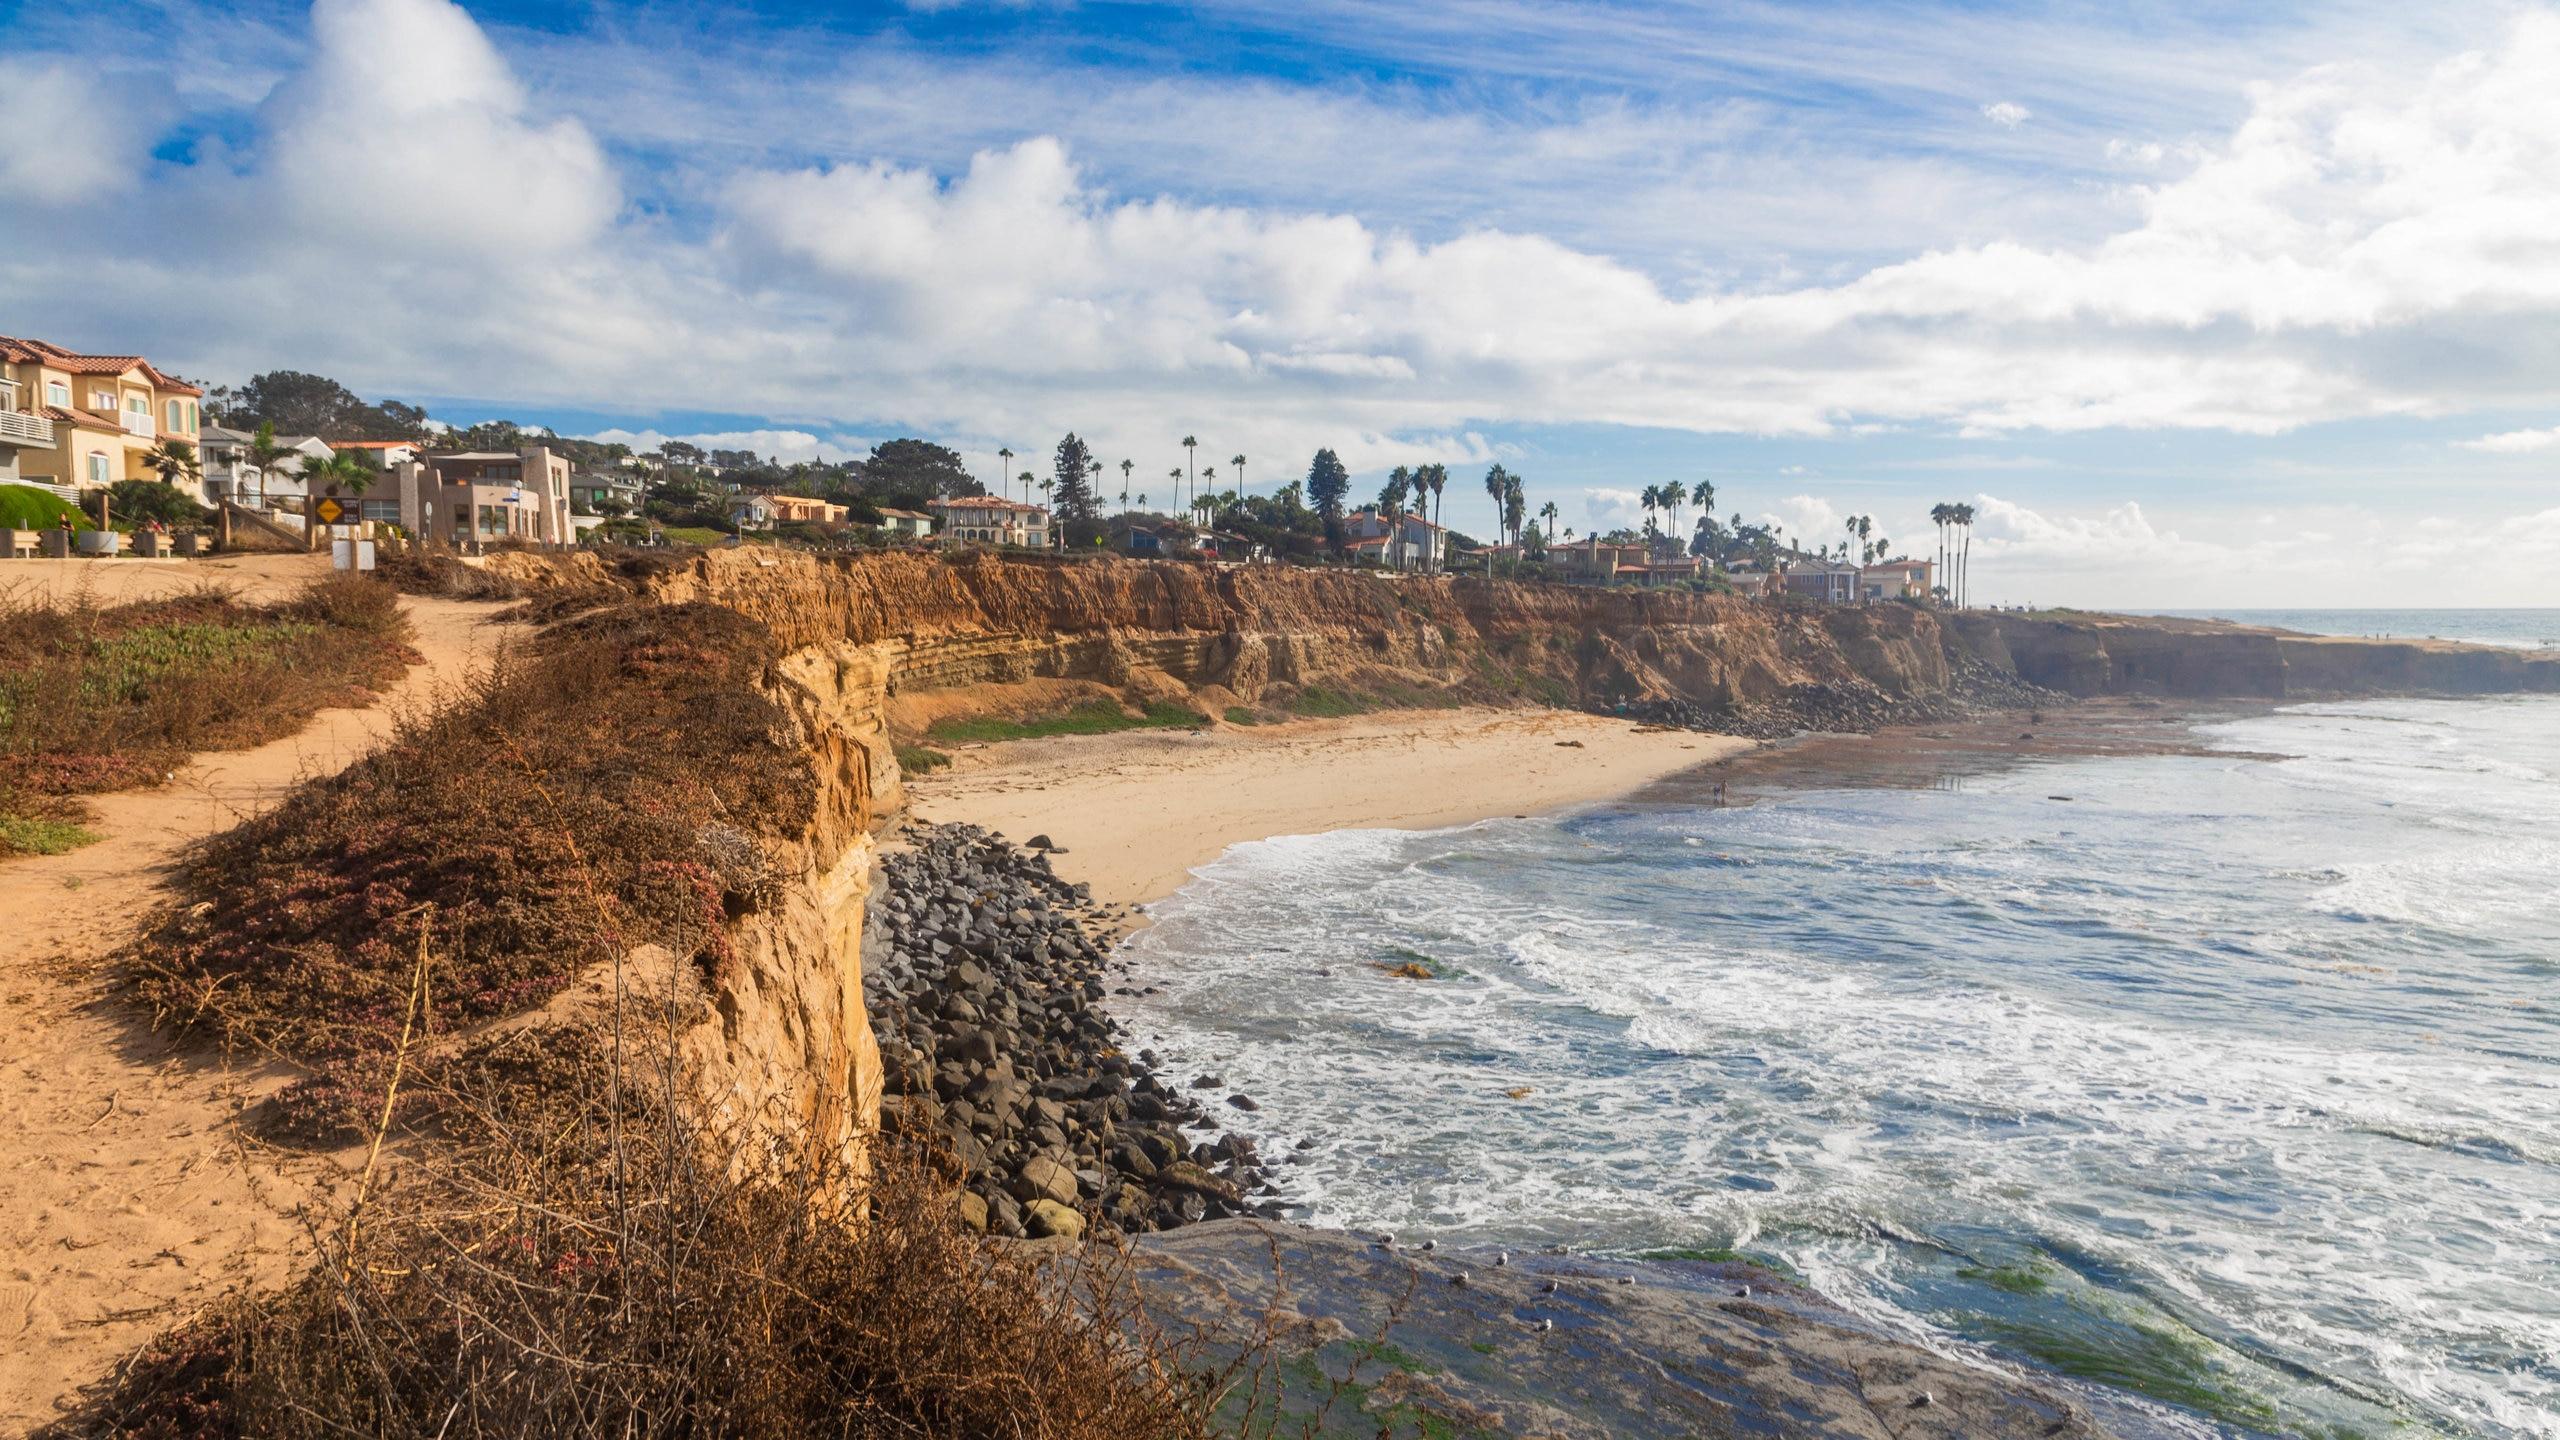 Point Loma, San Diego, California, United States of America